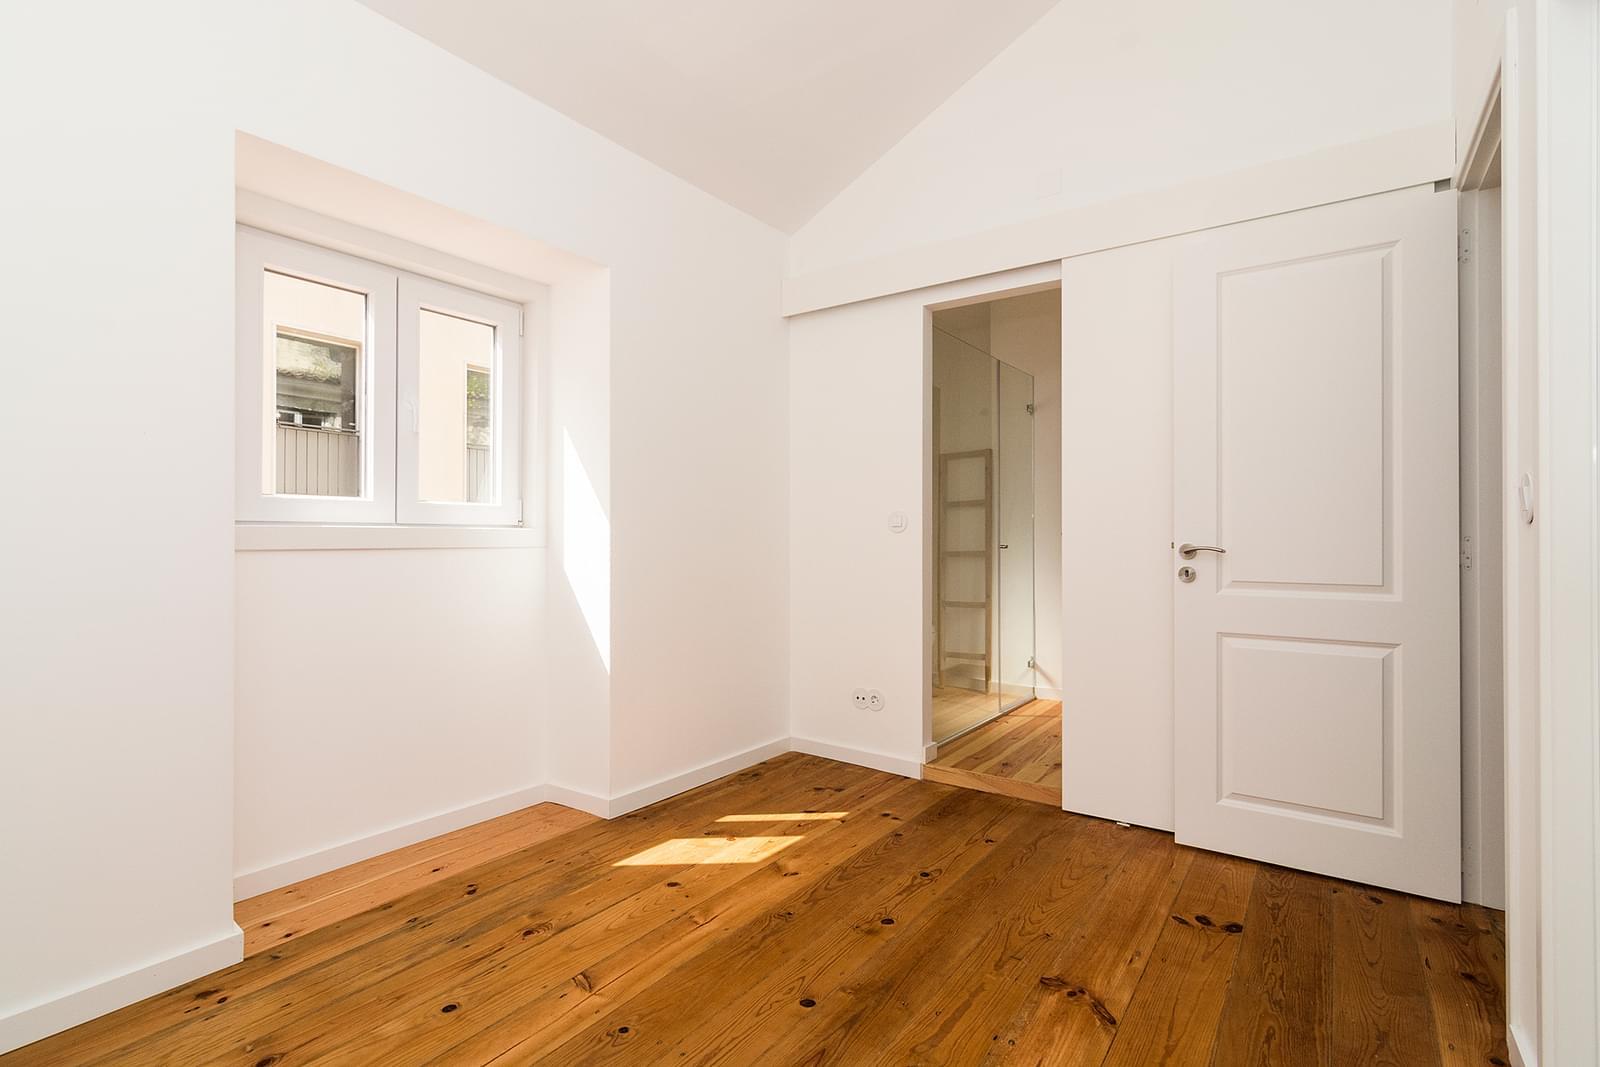 pf16908-apartamento-t2-lisboa-b764217a-e912-4b8e-9358-1ba1812afdbb